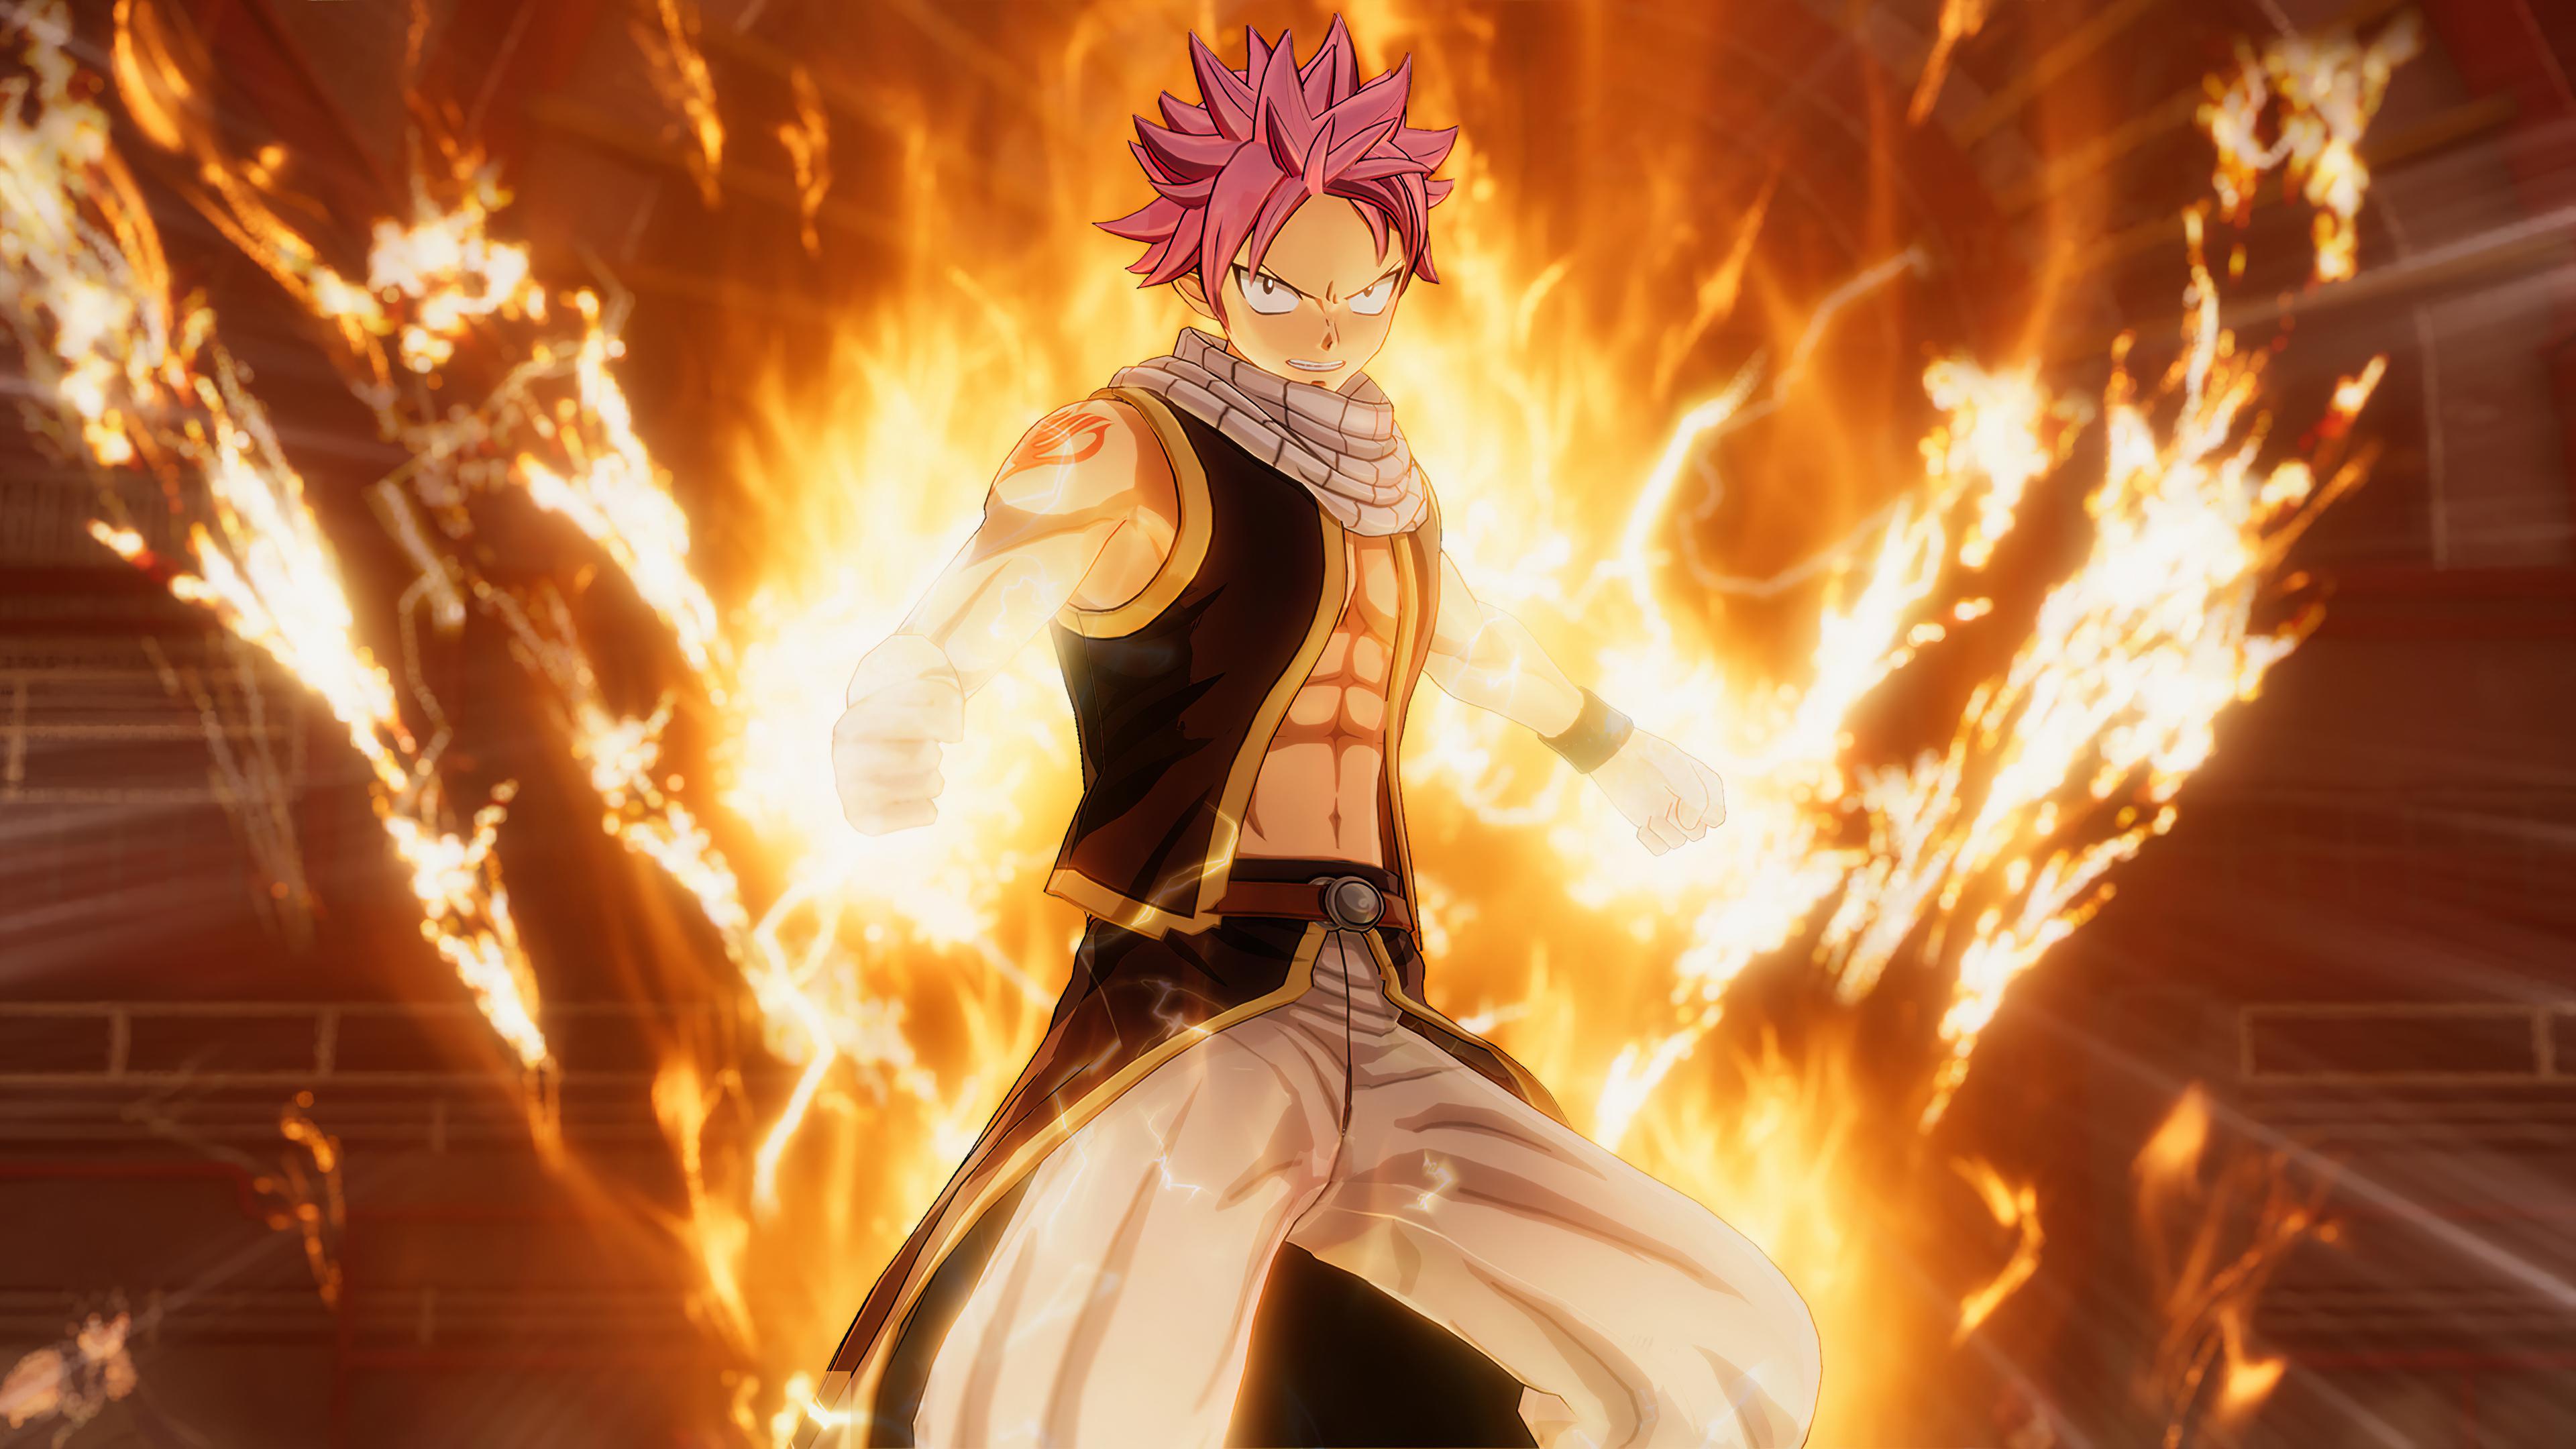 Natsu Dragneel Fairy Tail, HD Anime, 4k